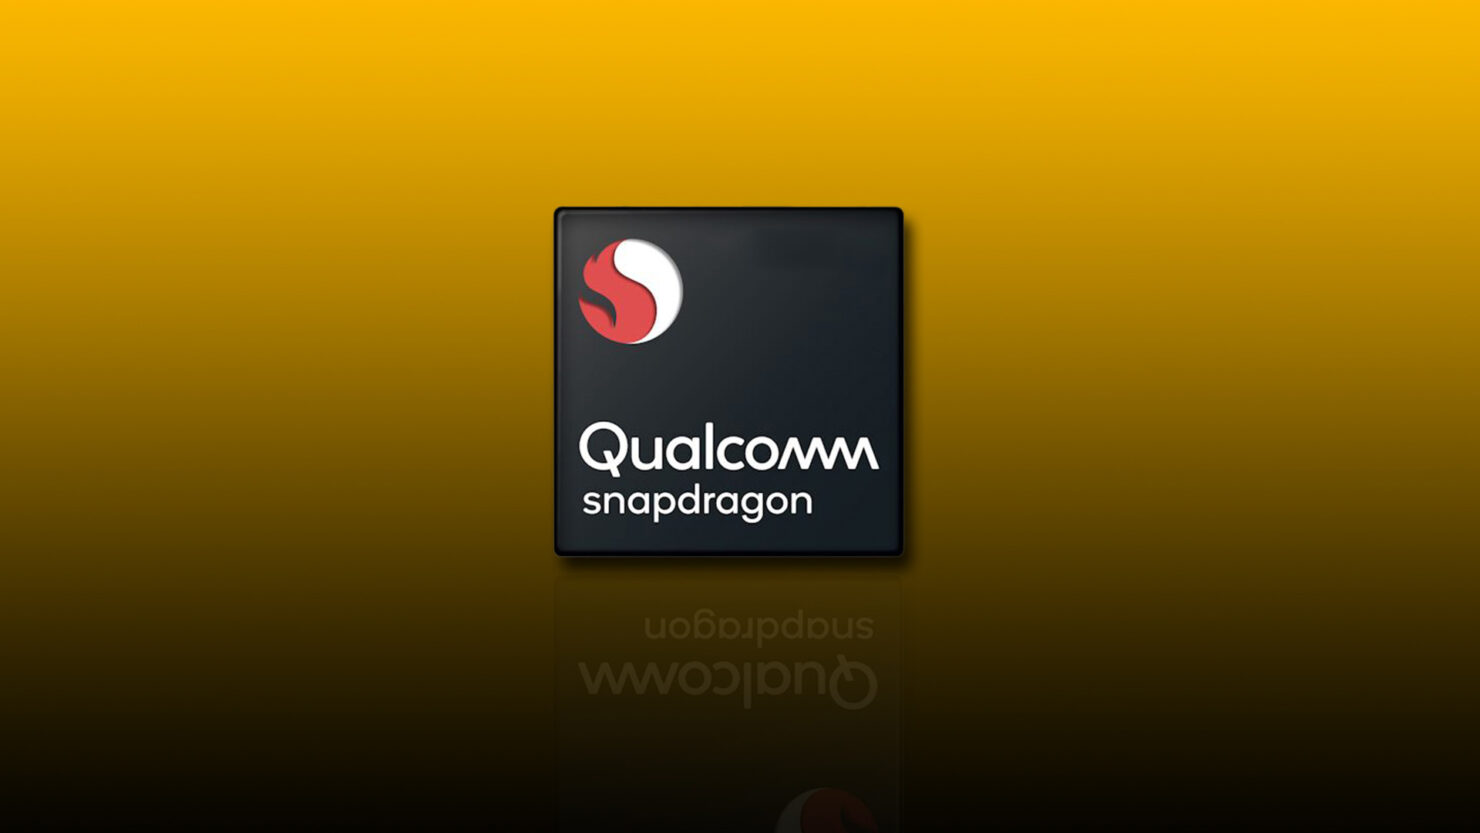 Snapdragon 865 Plus Launch Won't Happen This Year, Says Qualcomm's Phone Partner